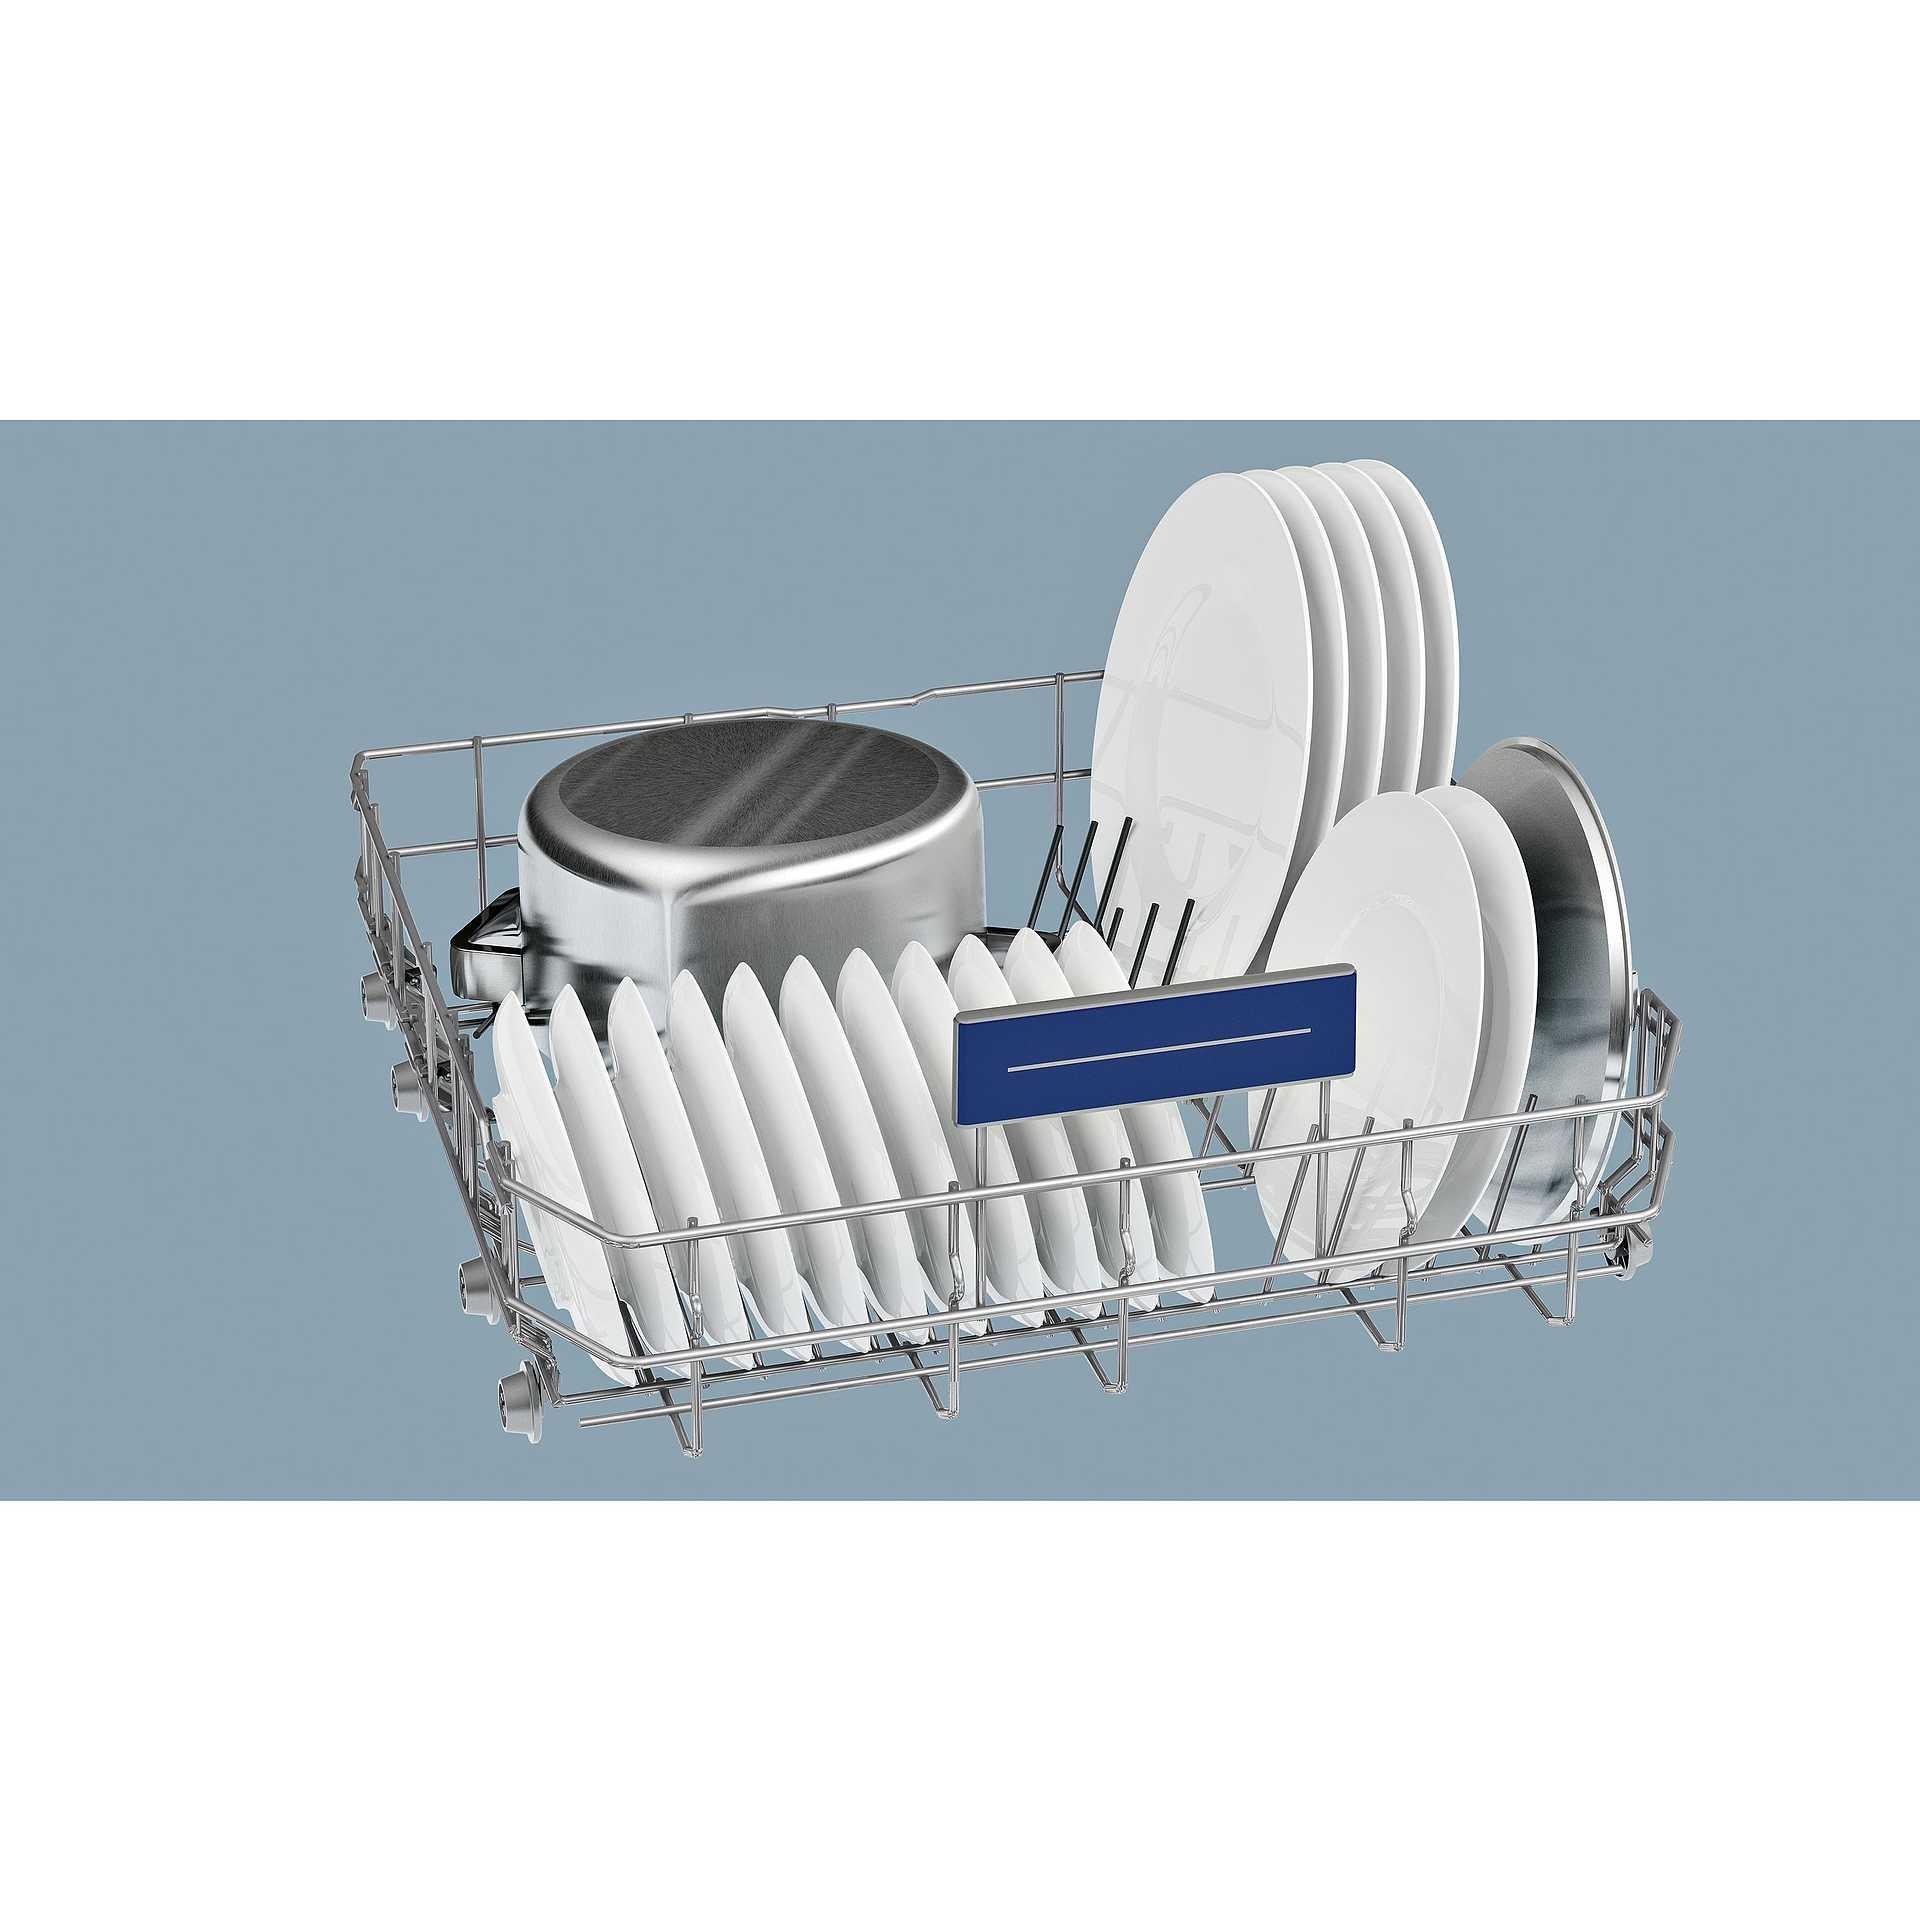 SN536S01KE Siemens lavastoviglie integrabile 60 cm 13 coperti classe ...